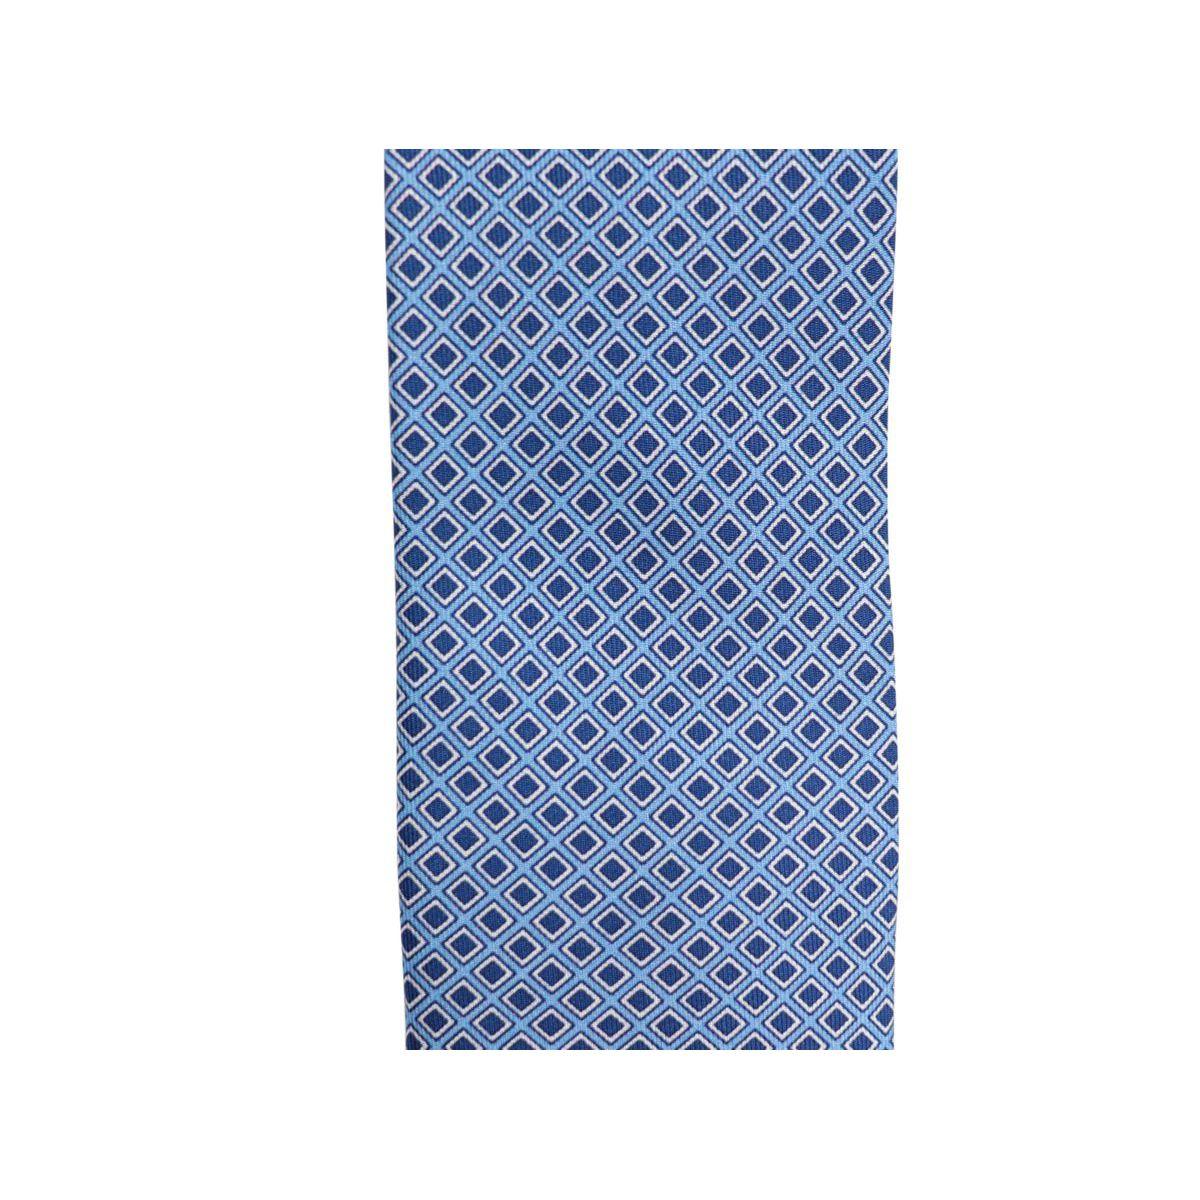 Geometric micro patterned silk tie CM 7 Light blue Church's